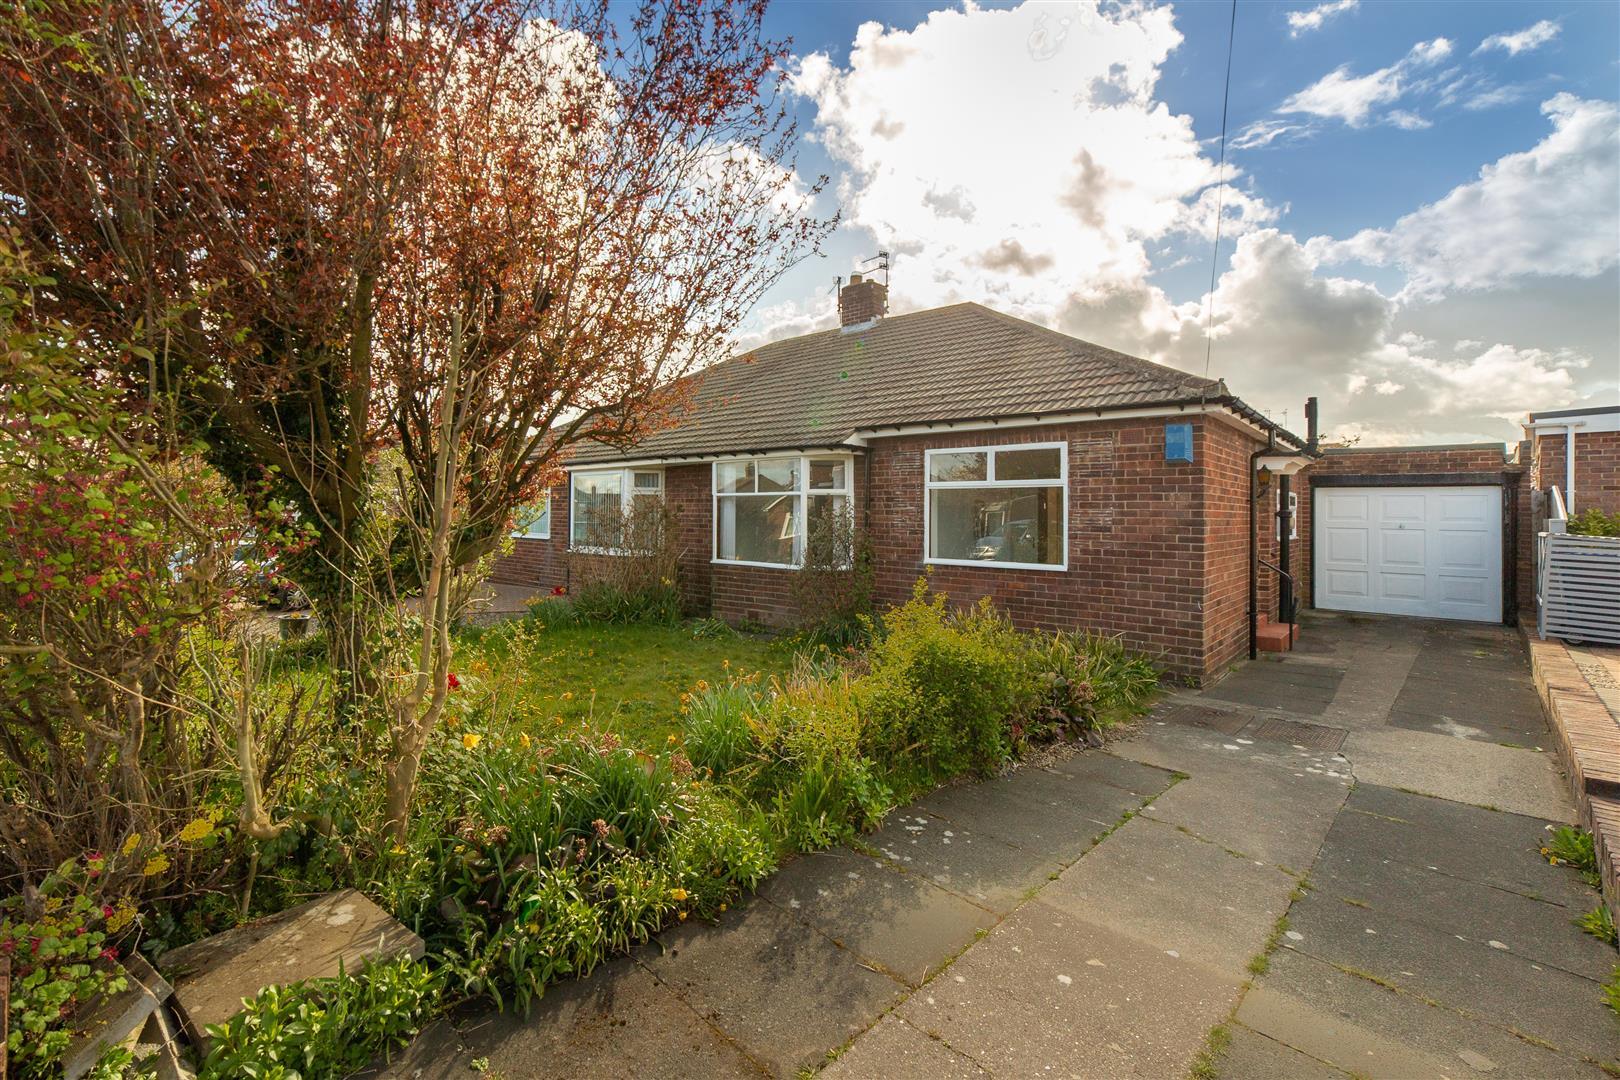 2 bed semi-detached bungalow for sale in Kirkwood Place, Brunton Park, NE3